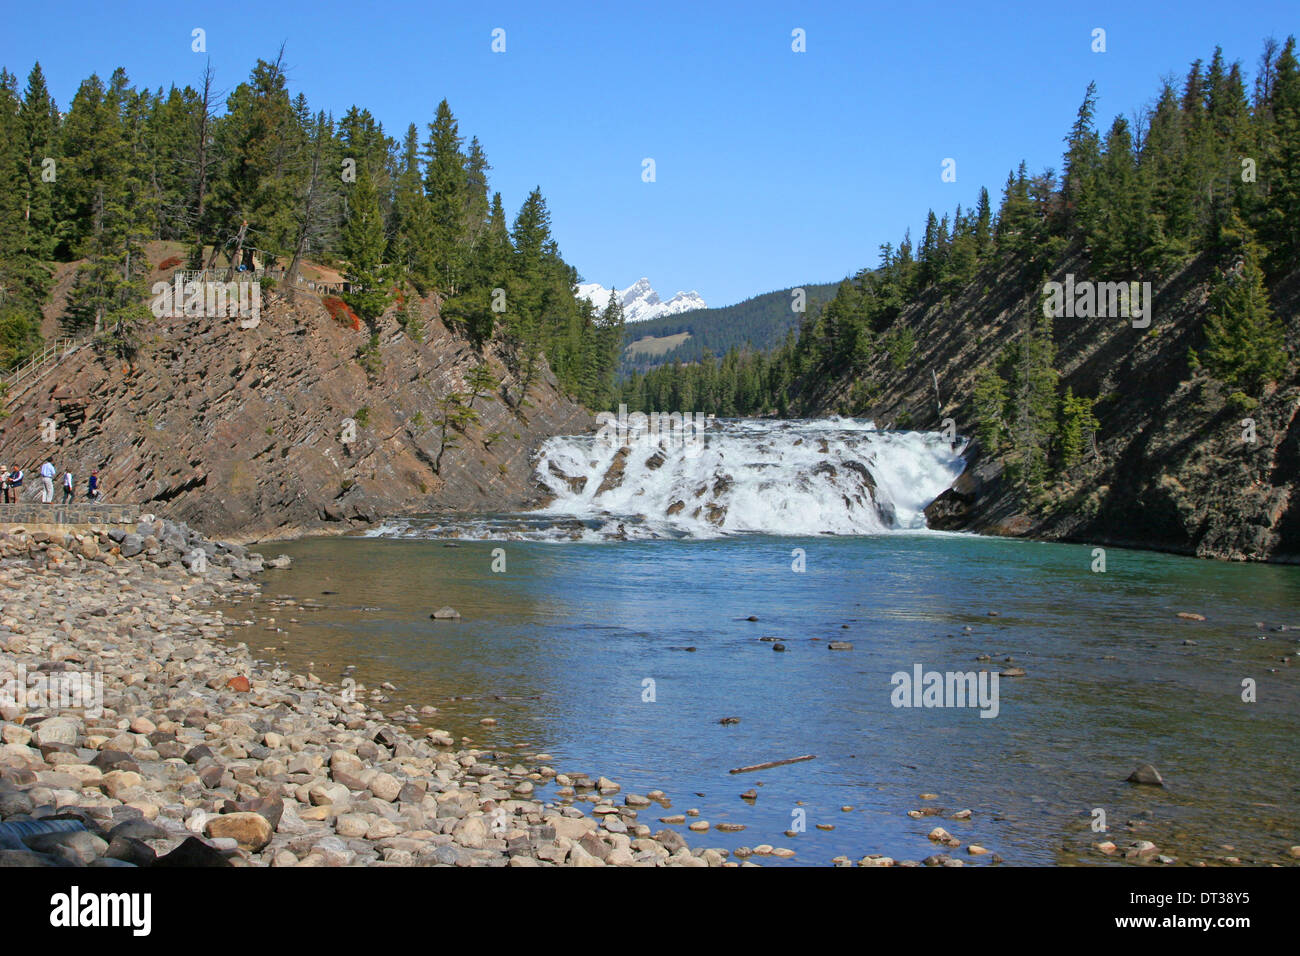 Bow River Falls und Bogen Brücke Banff, Canadian Rockies Stockbild